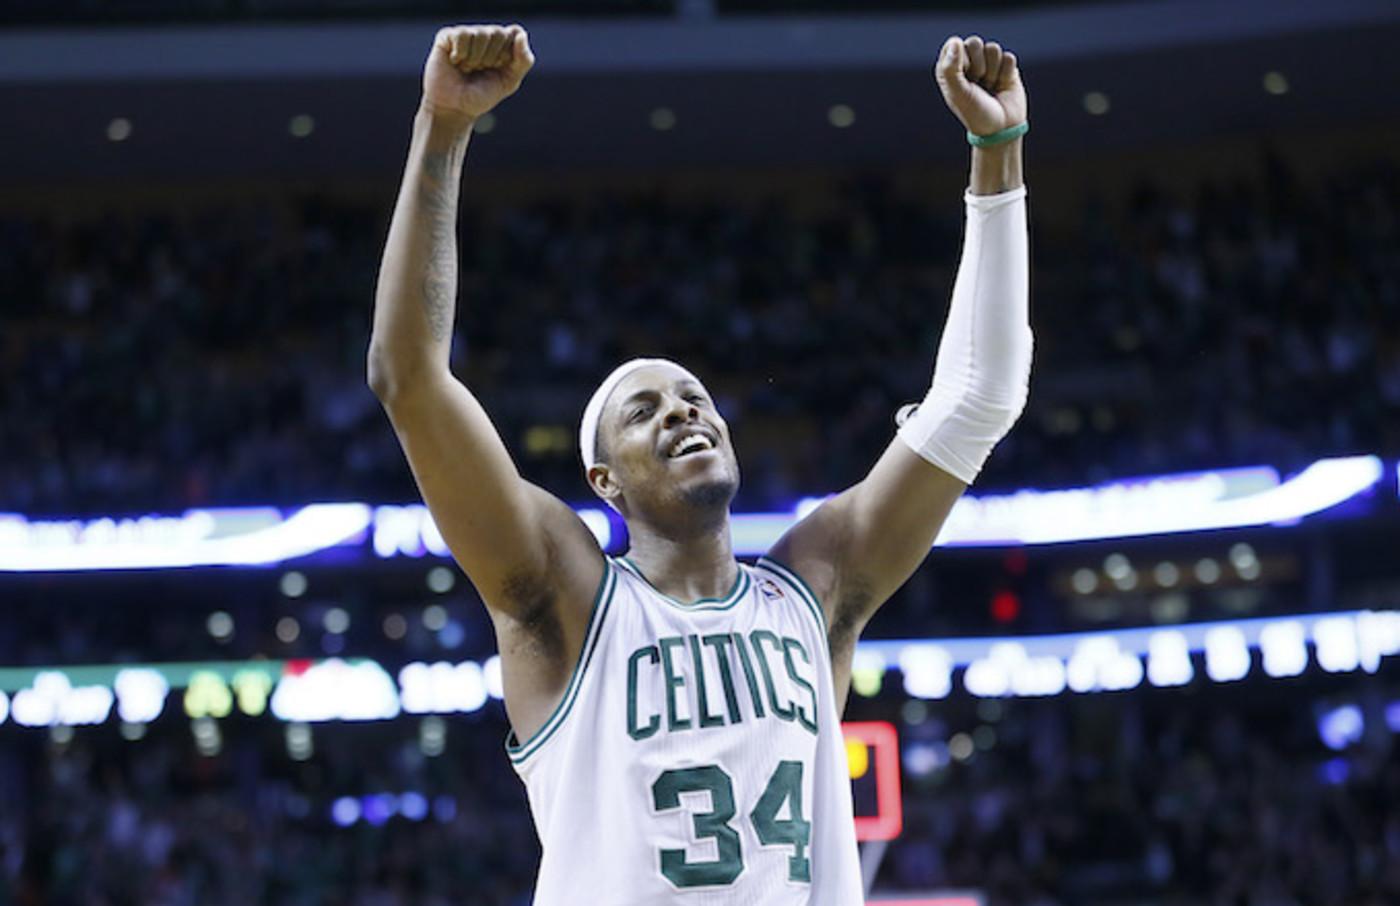 Paul Pierce celebrates win after Celtics 118-114 3OT victory over the Denver Nuggets.